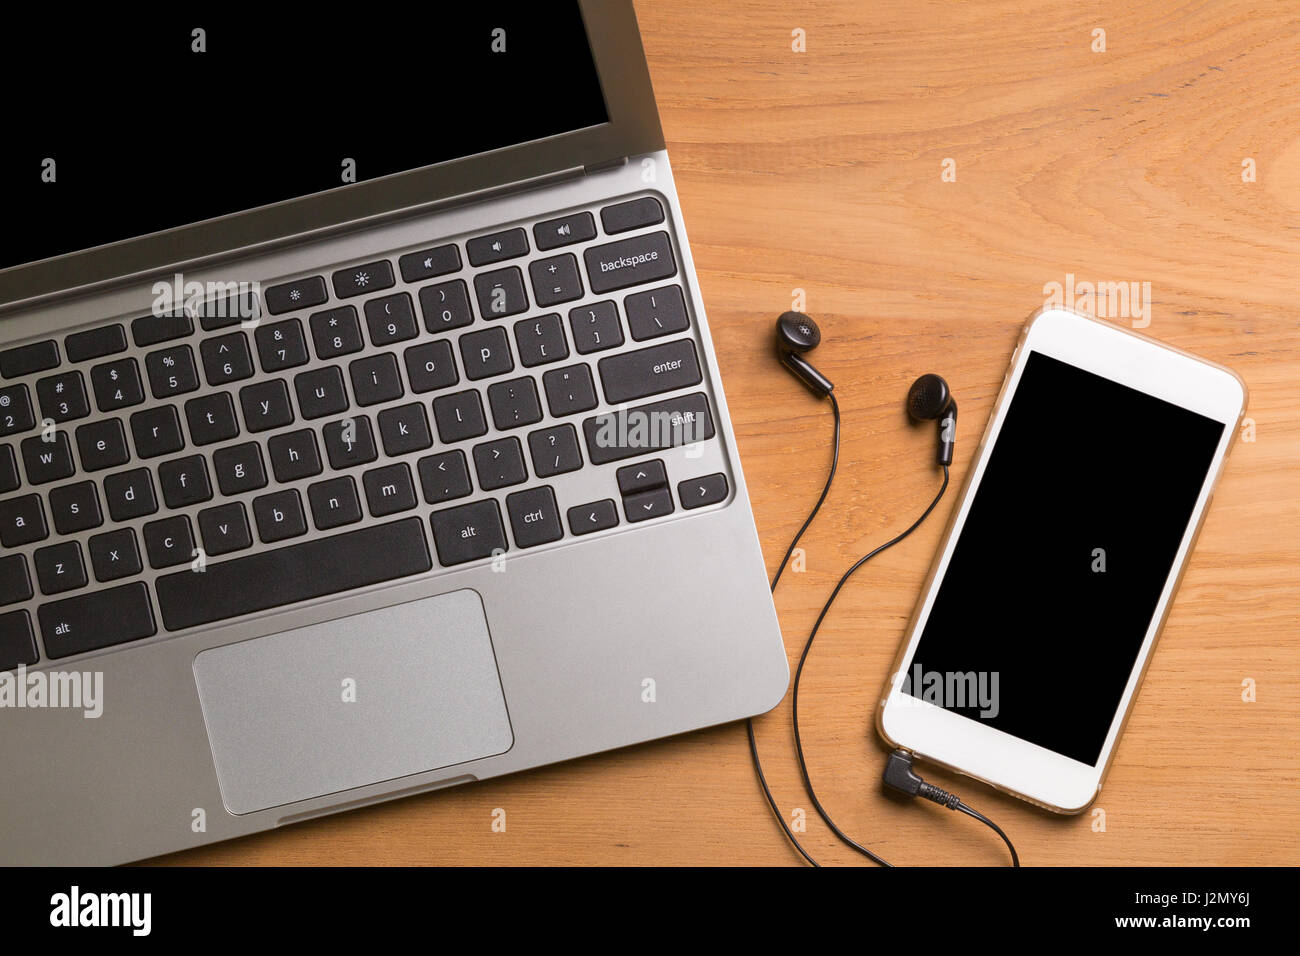 Portable computer laptop, smartphone, earphones, on wood table - Stock Image